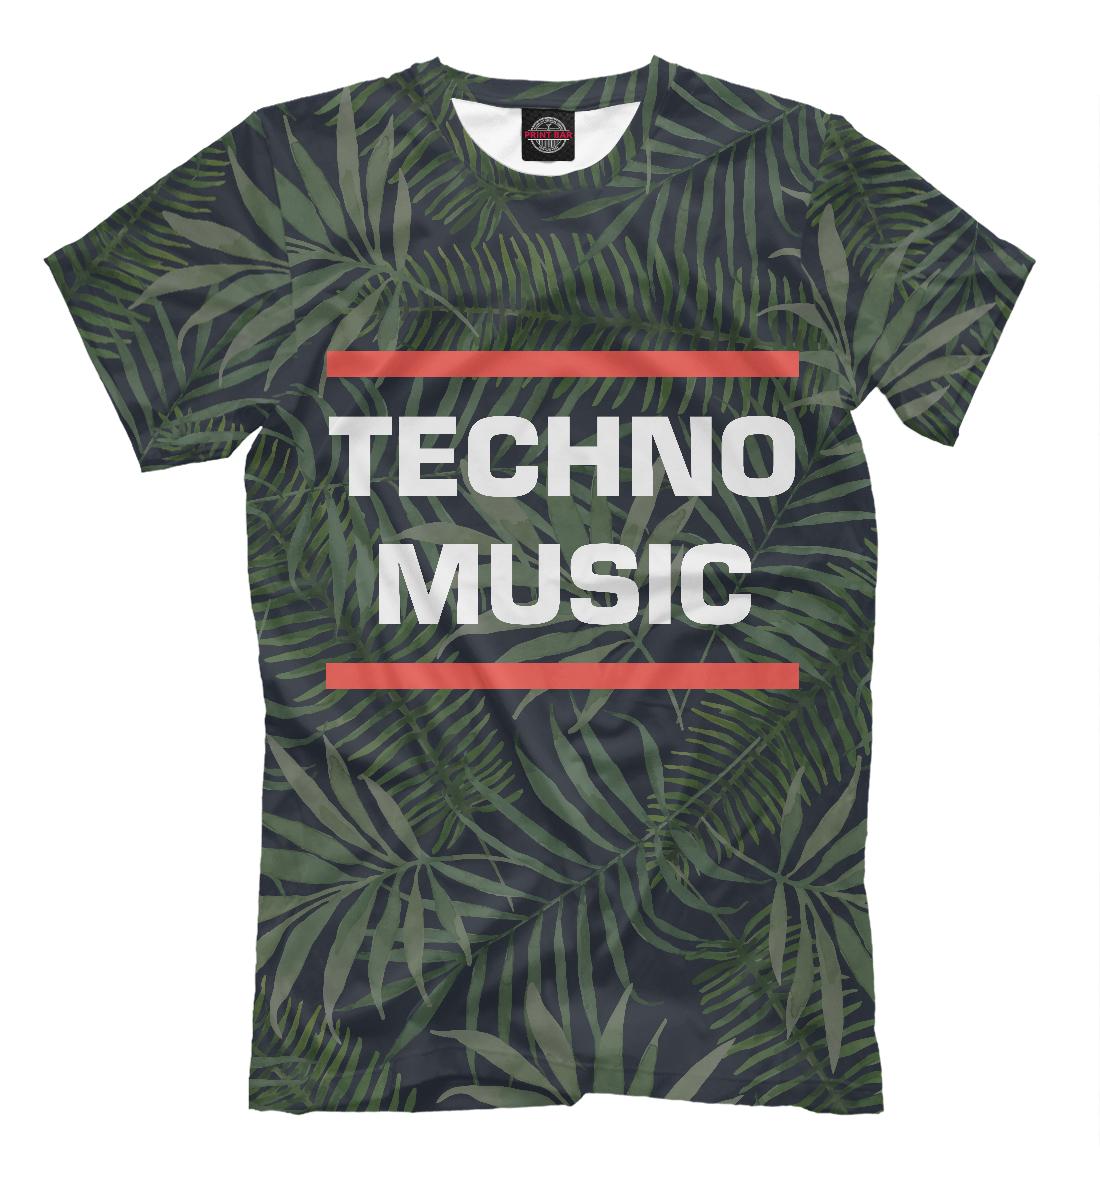 Купить Techno music, Printbar, Футболки, DJS-313981-fut-2